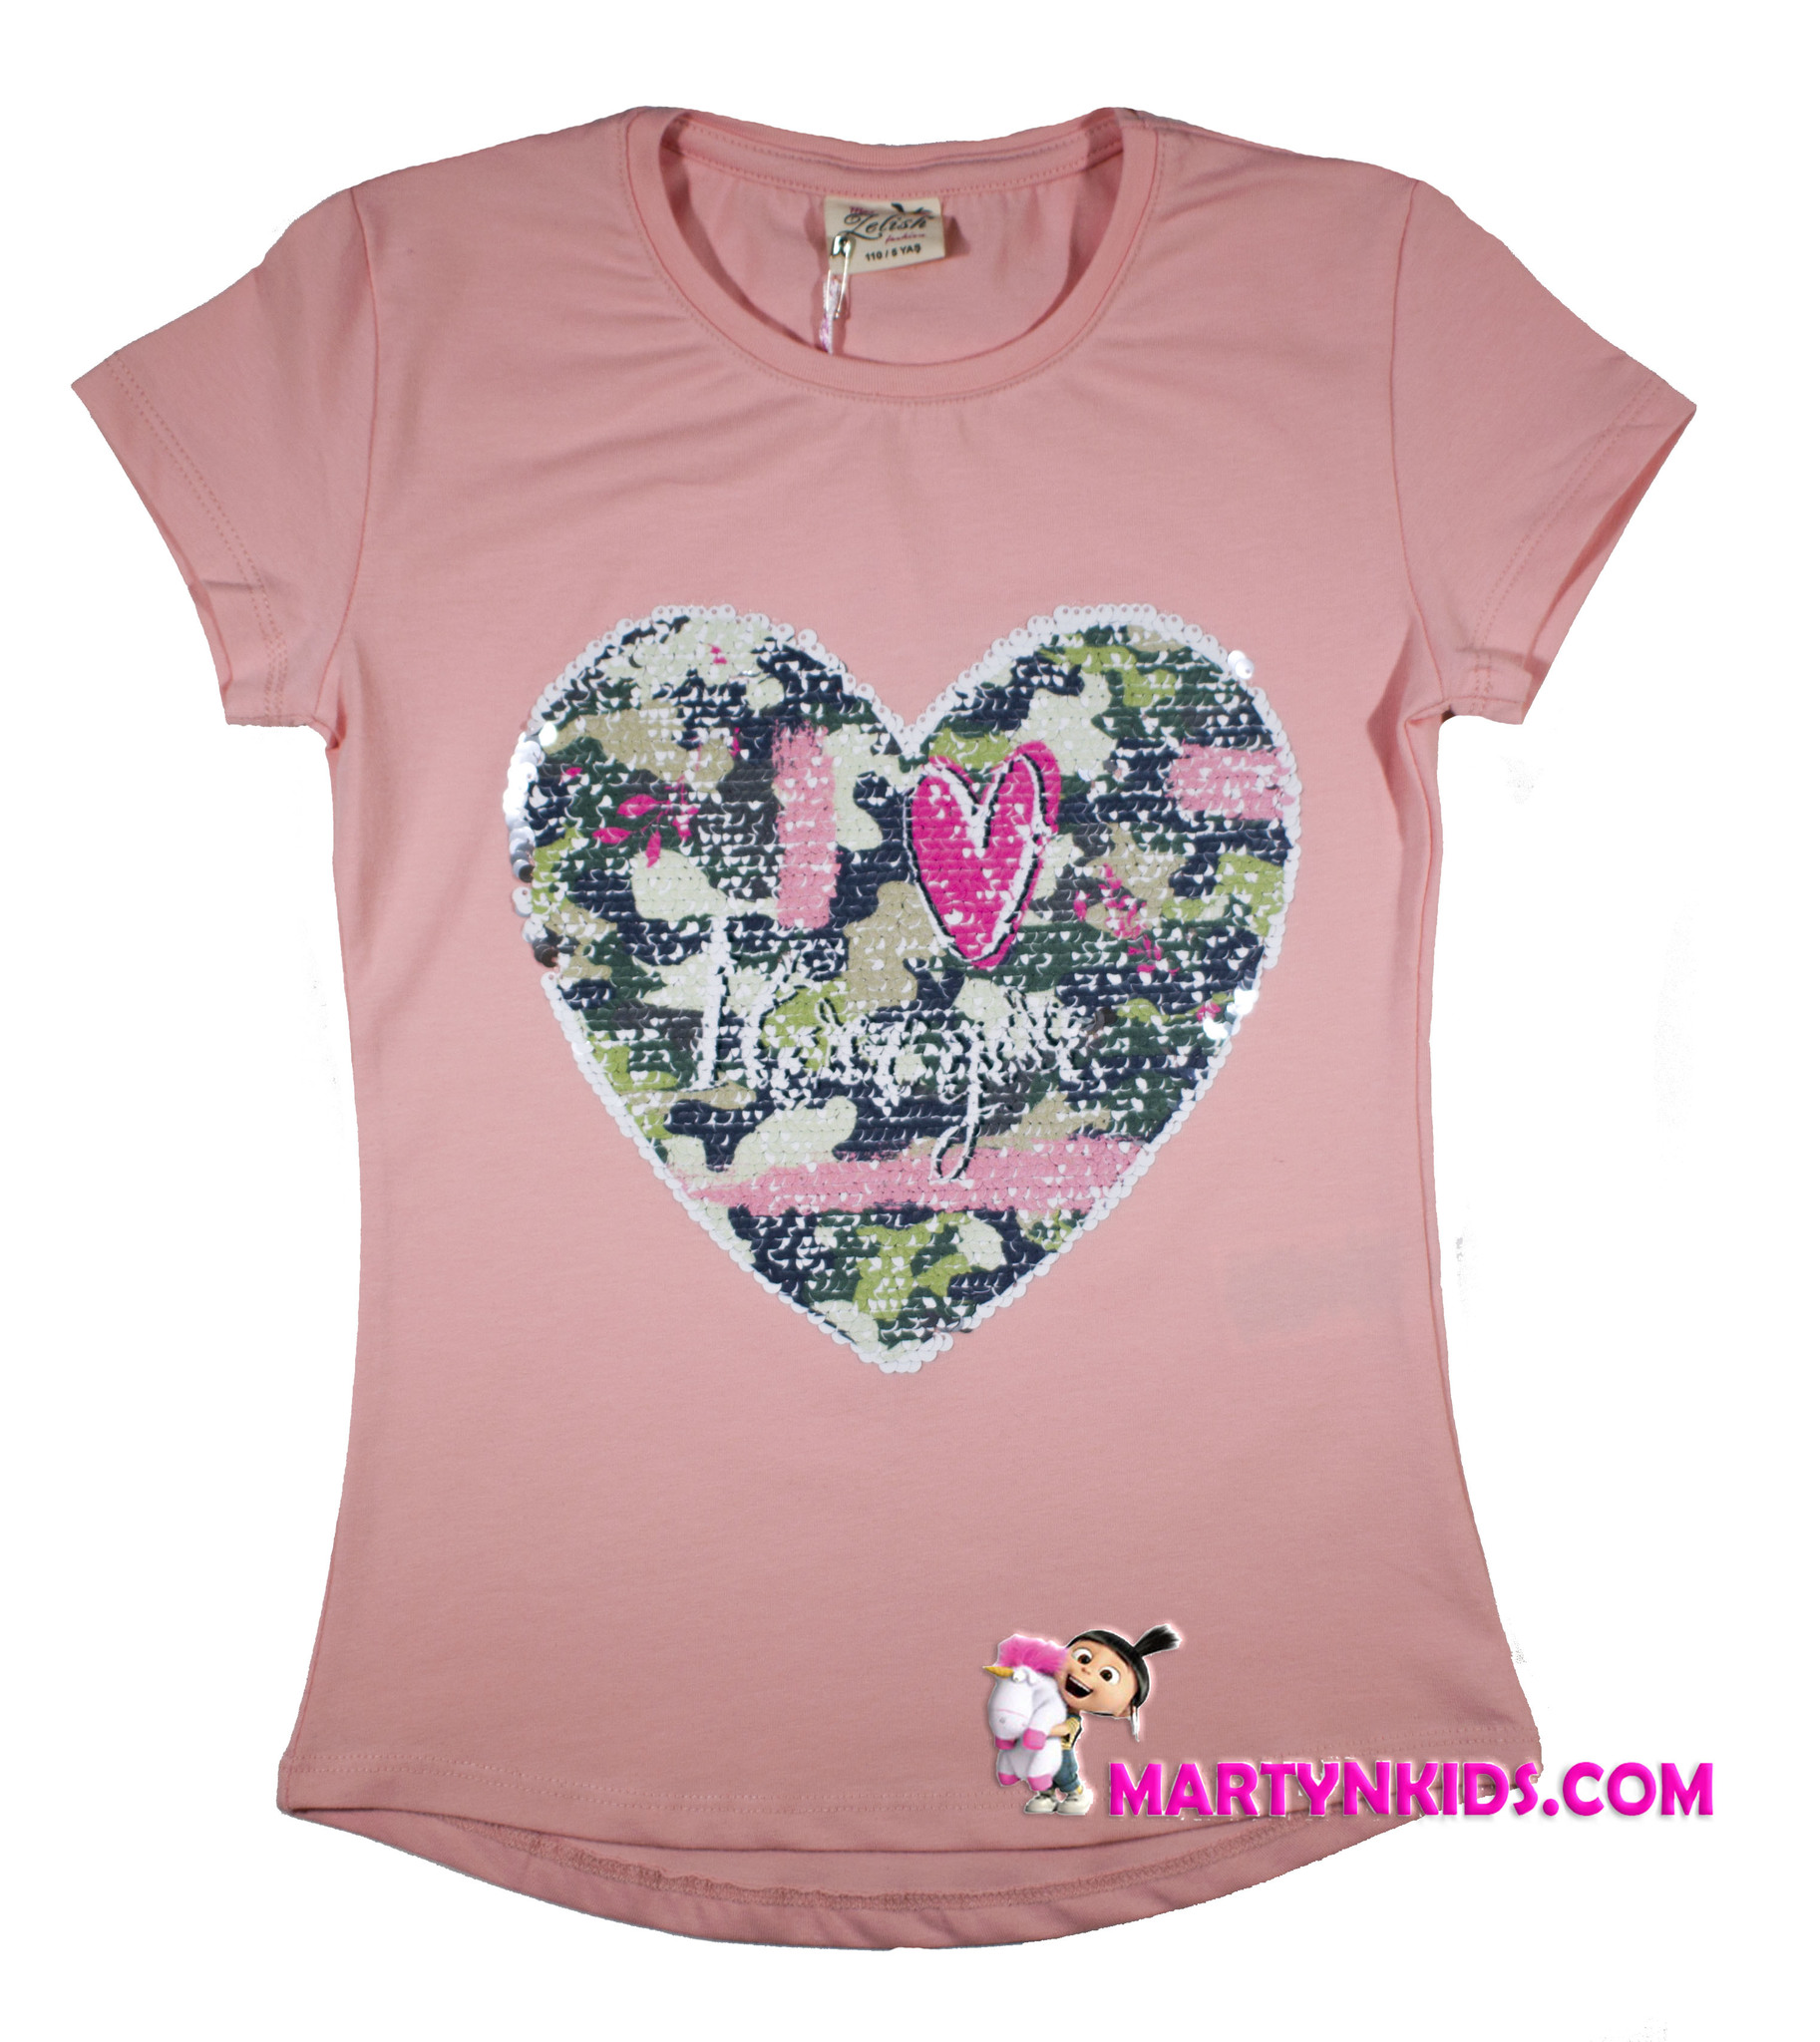 585 футболка пазлы